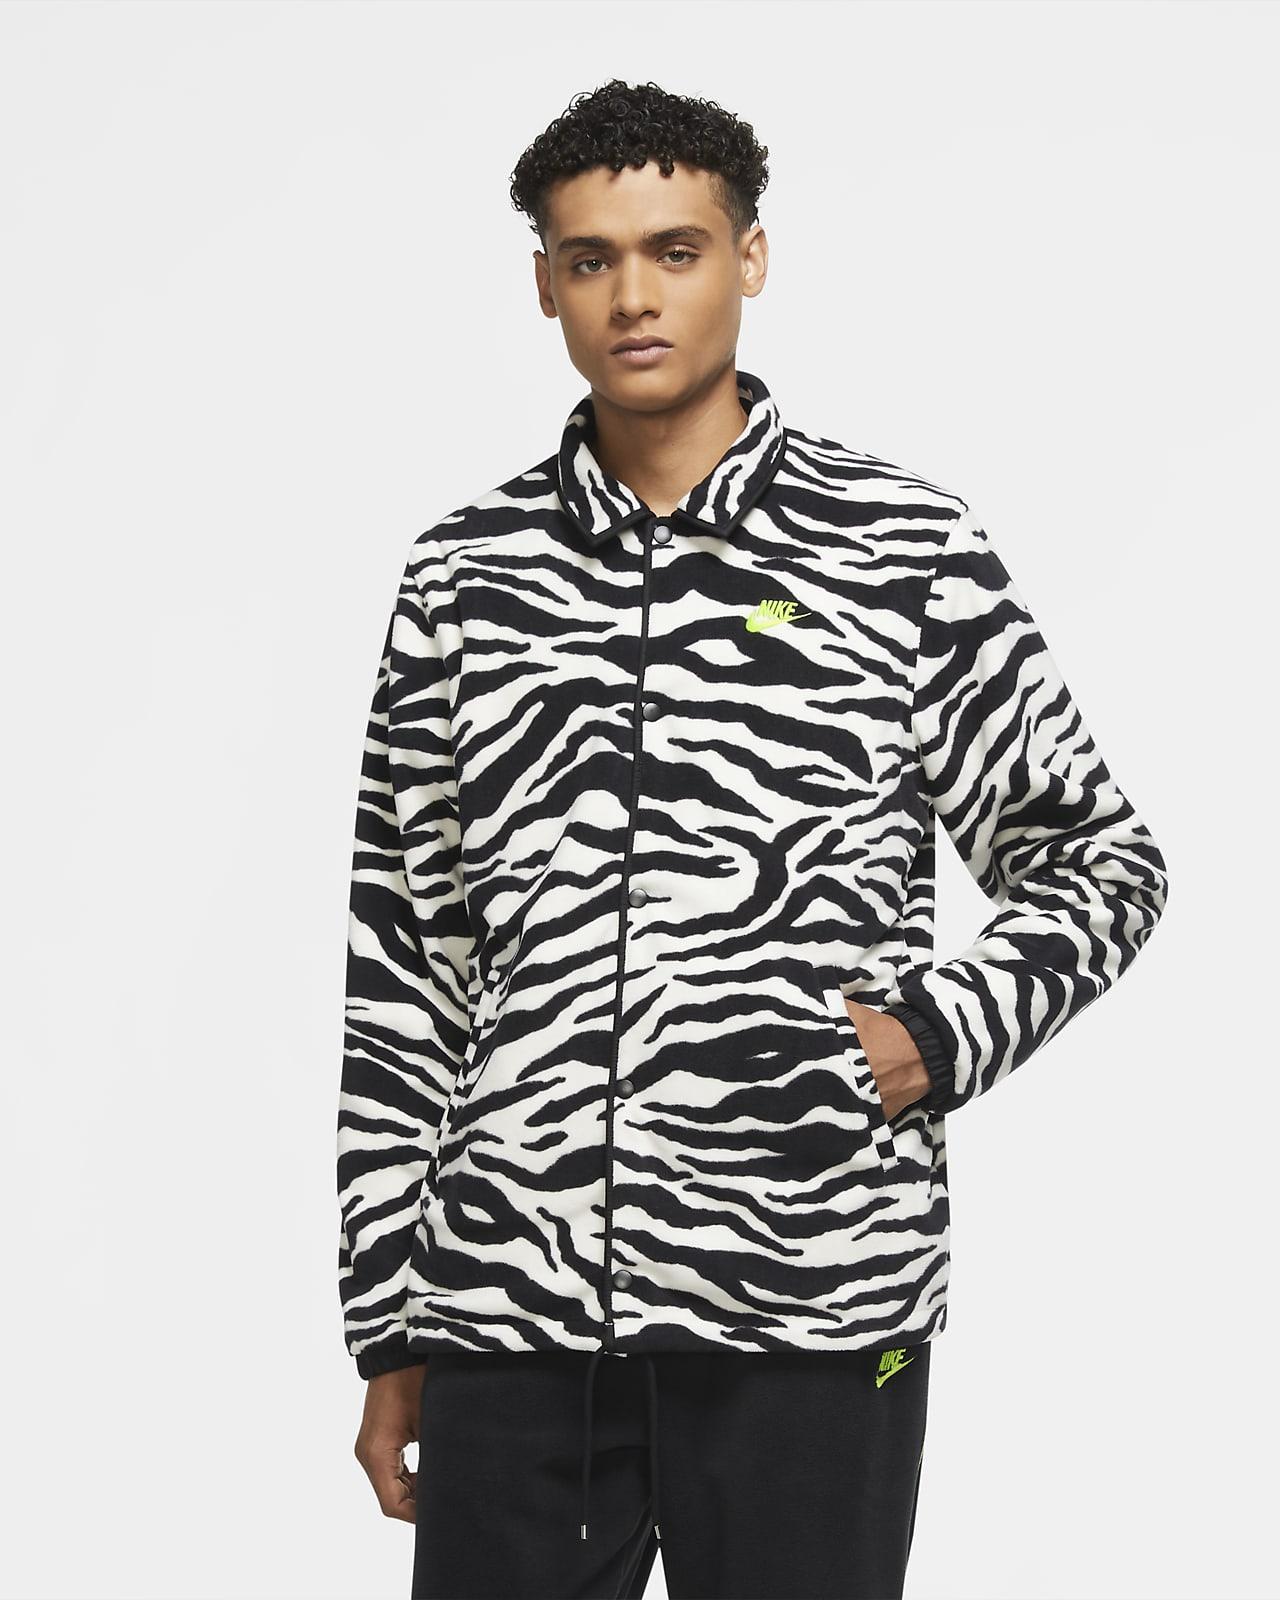 Nike Sportswear City Edition Men's Coaches Jacket